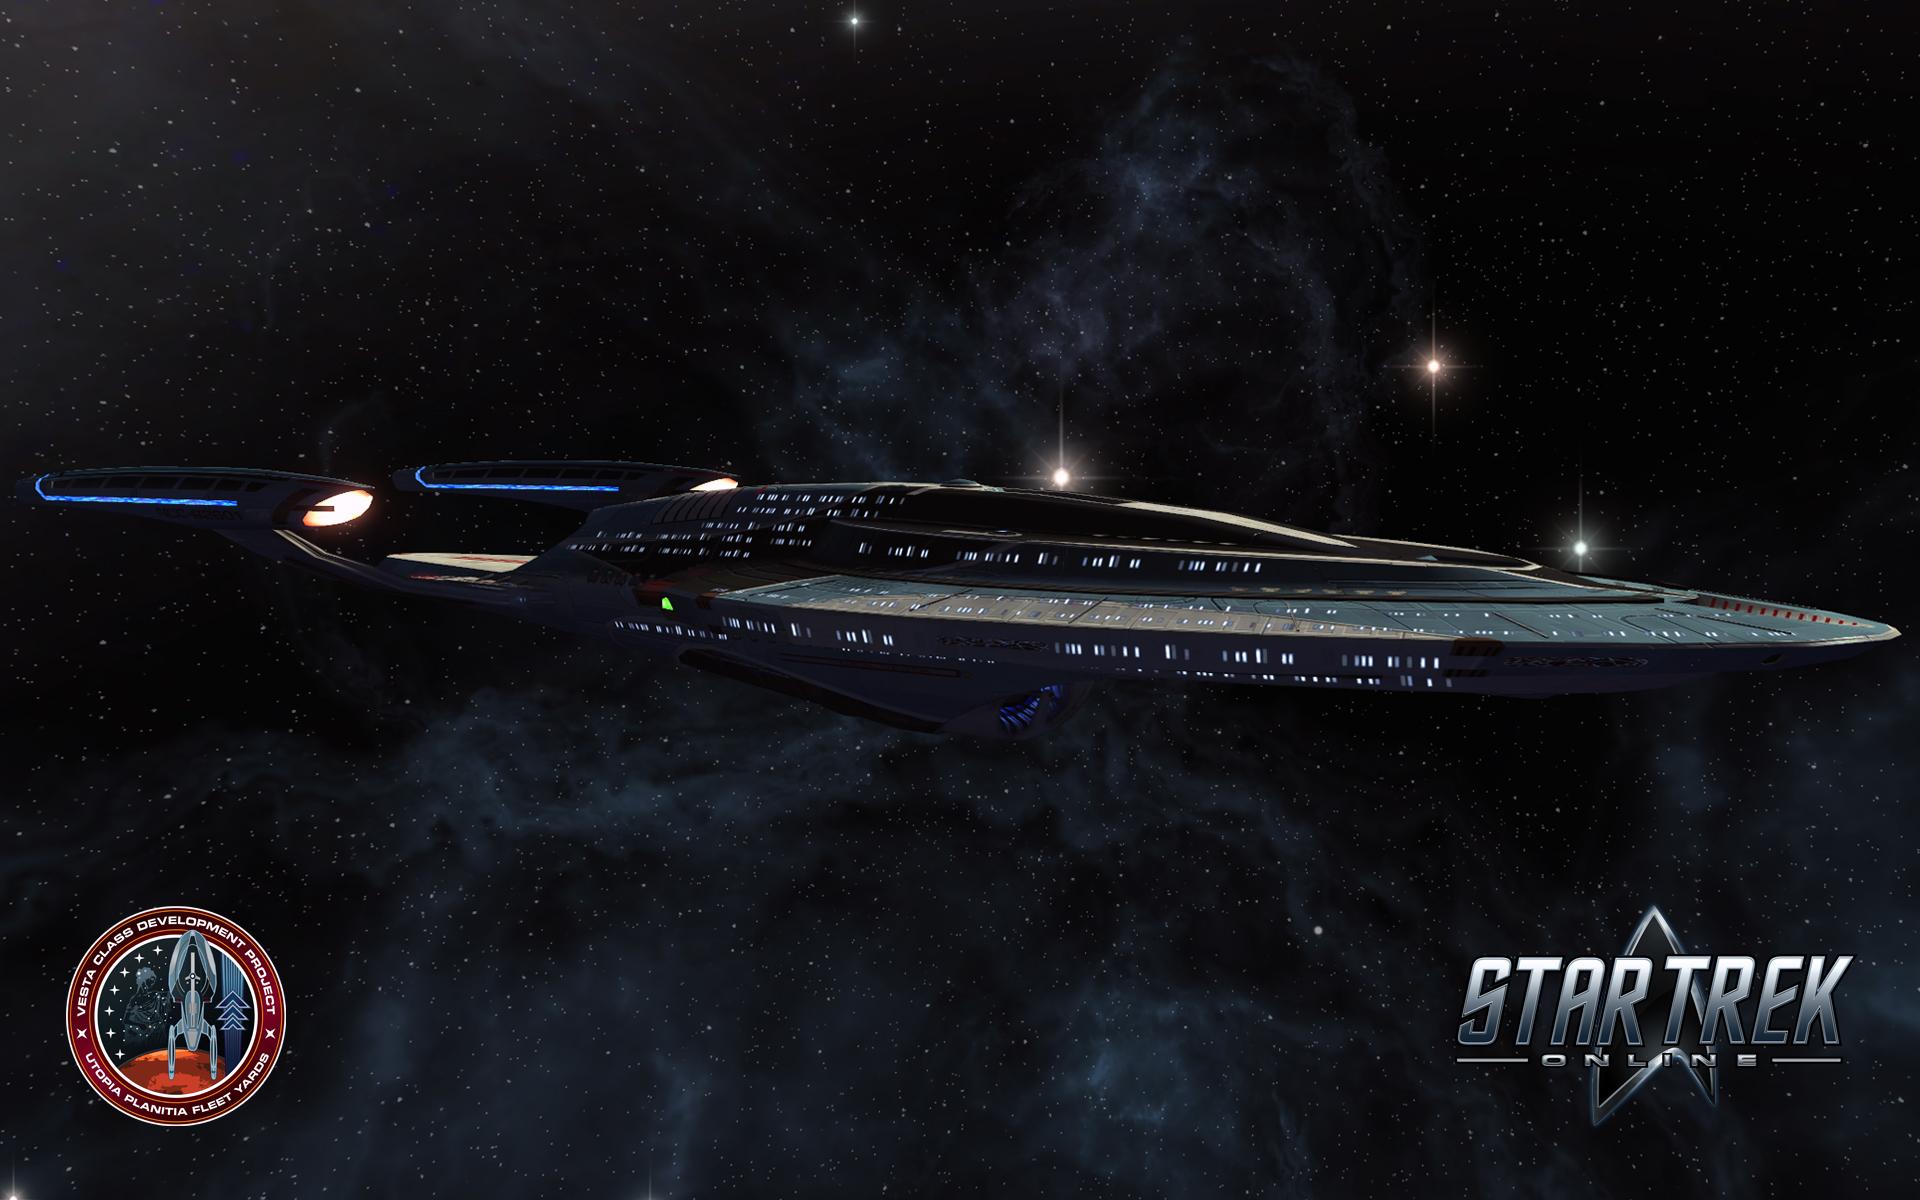 Star Trek Ship Wallpapers: Star Trek Ships Wallpaper